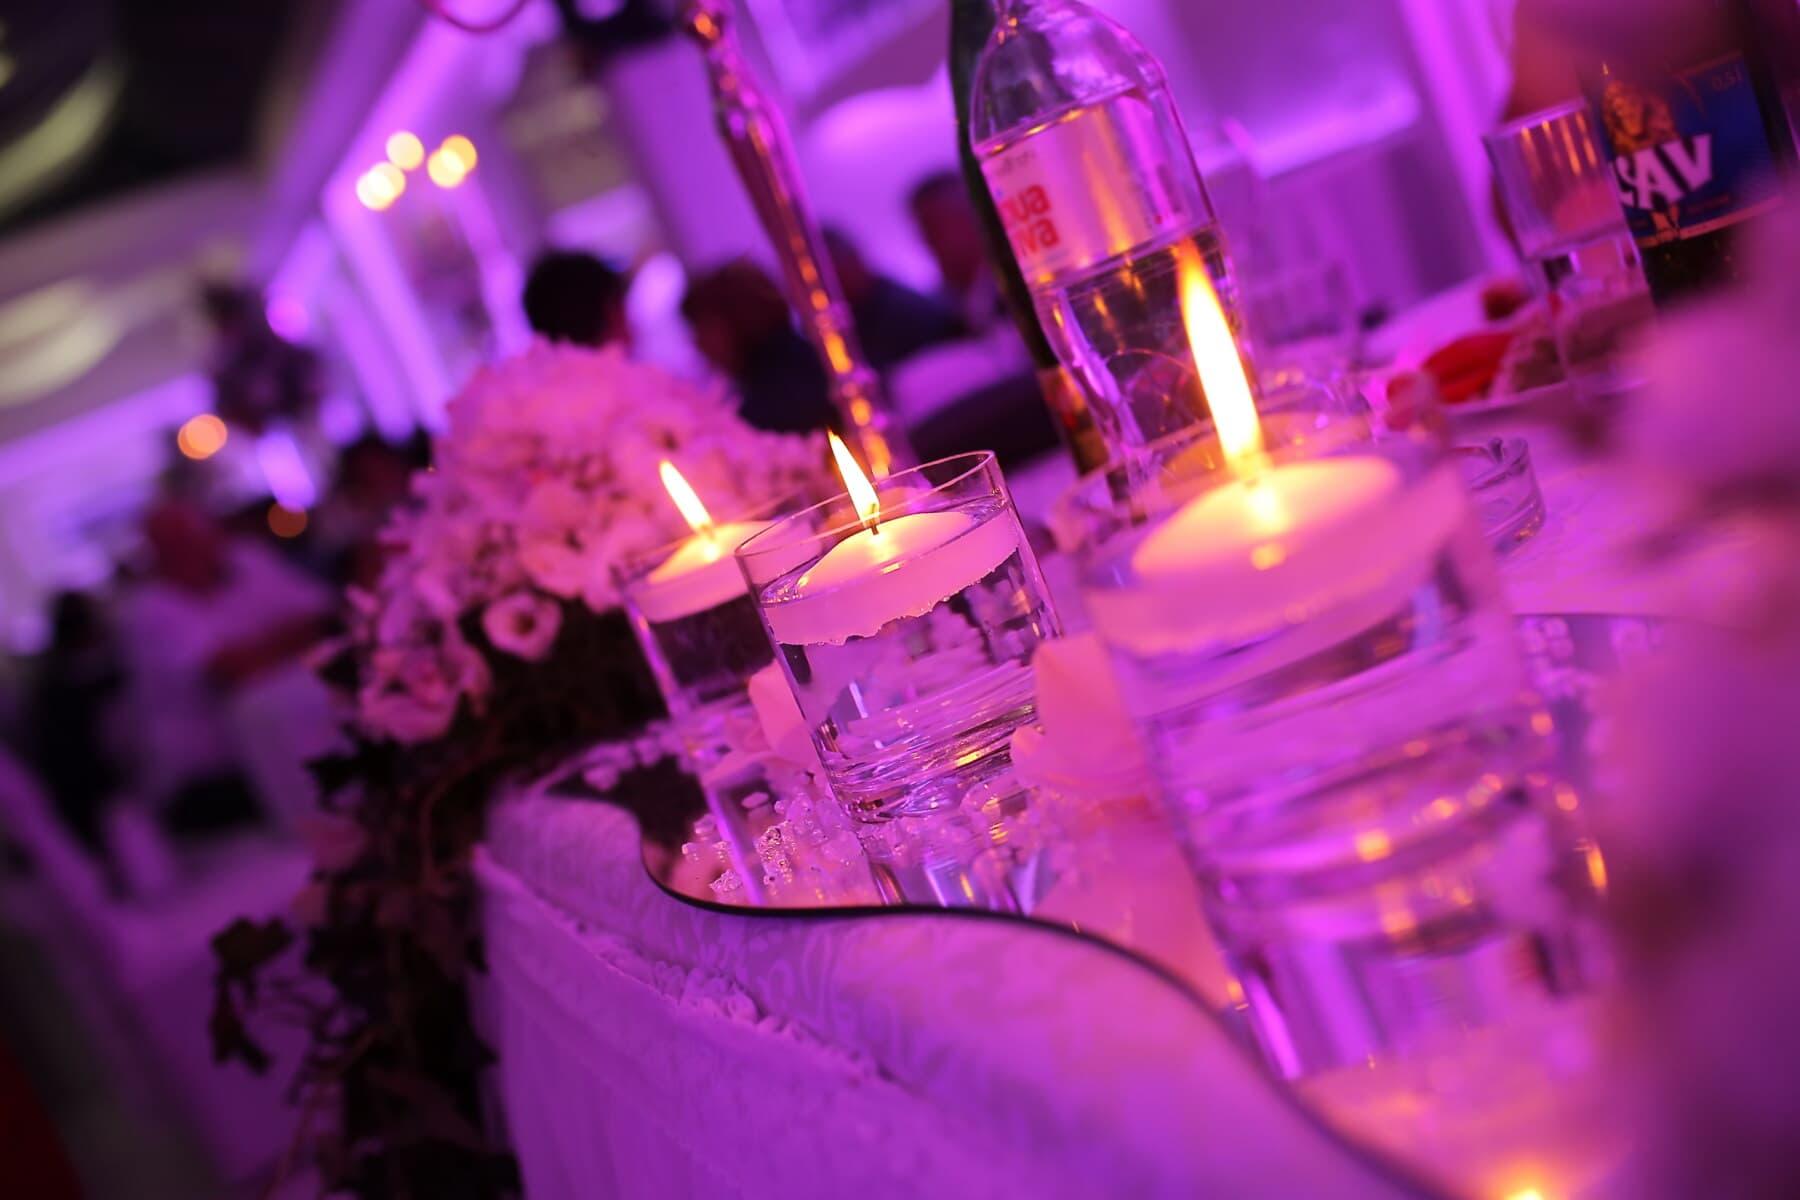 light, romantic, purplish, table, candles, close-up, candlelight, party, candle, celebration